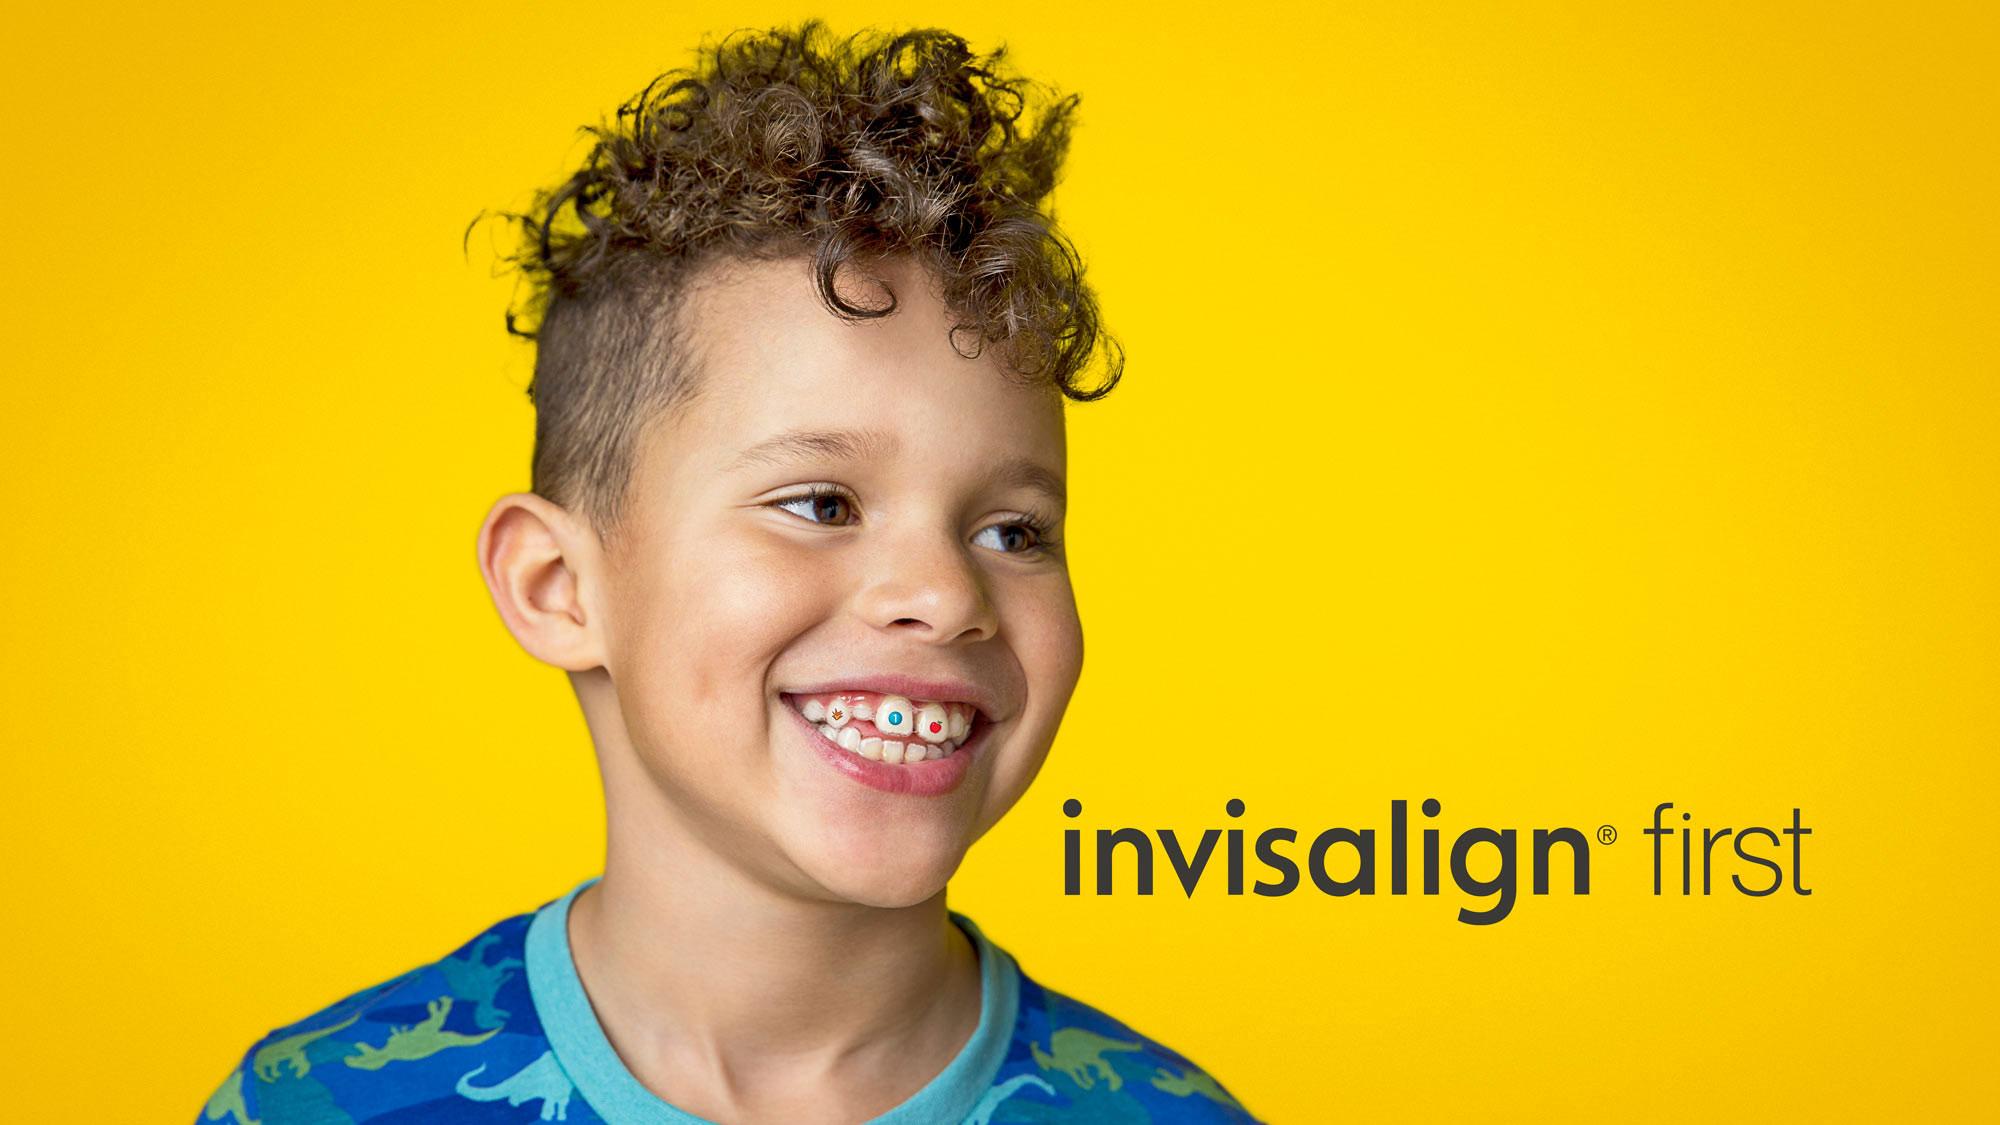 Invisalign® First